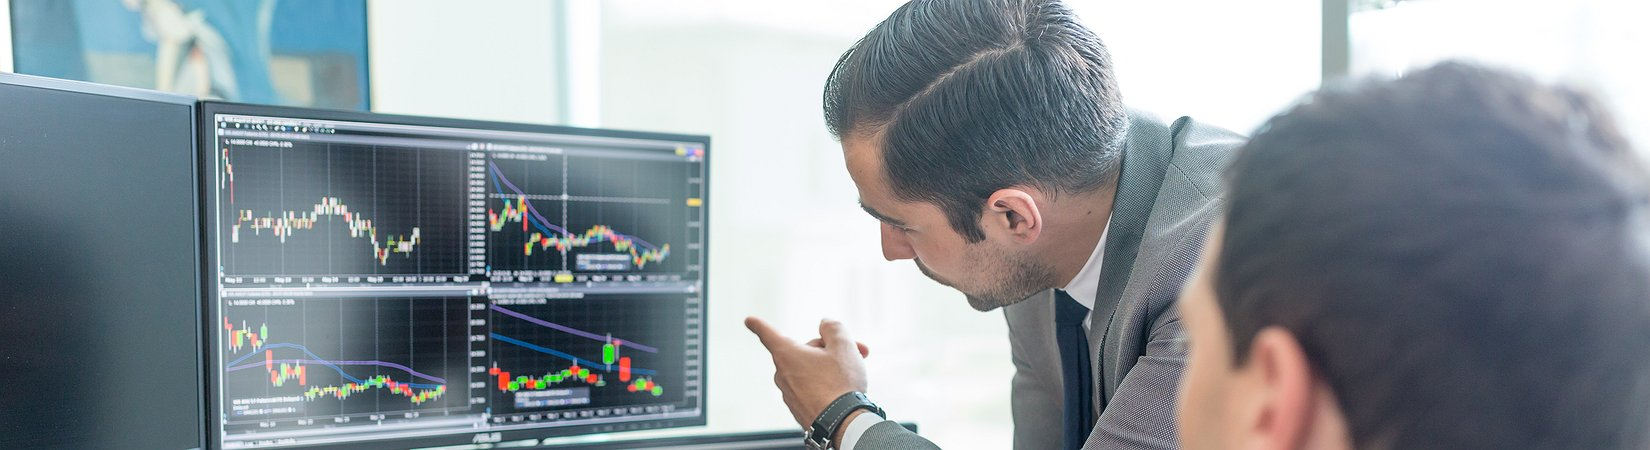 Анализ рынка криптовалют 01.02.2018